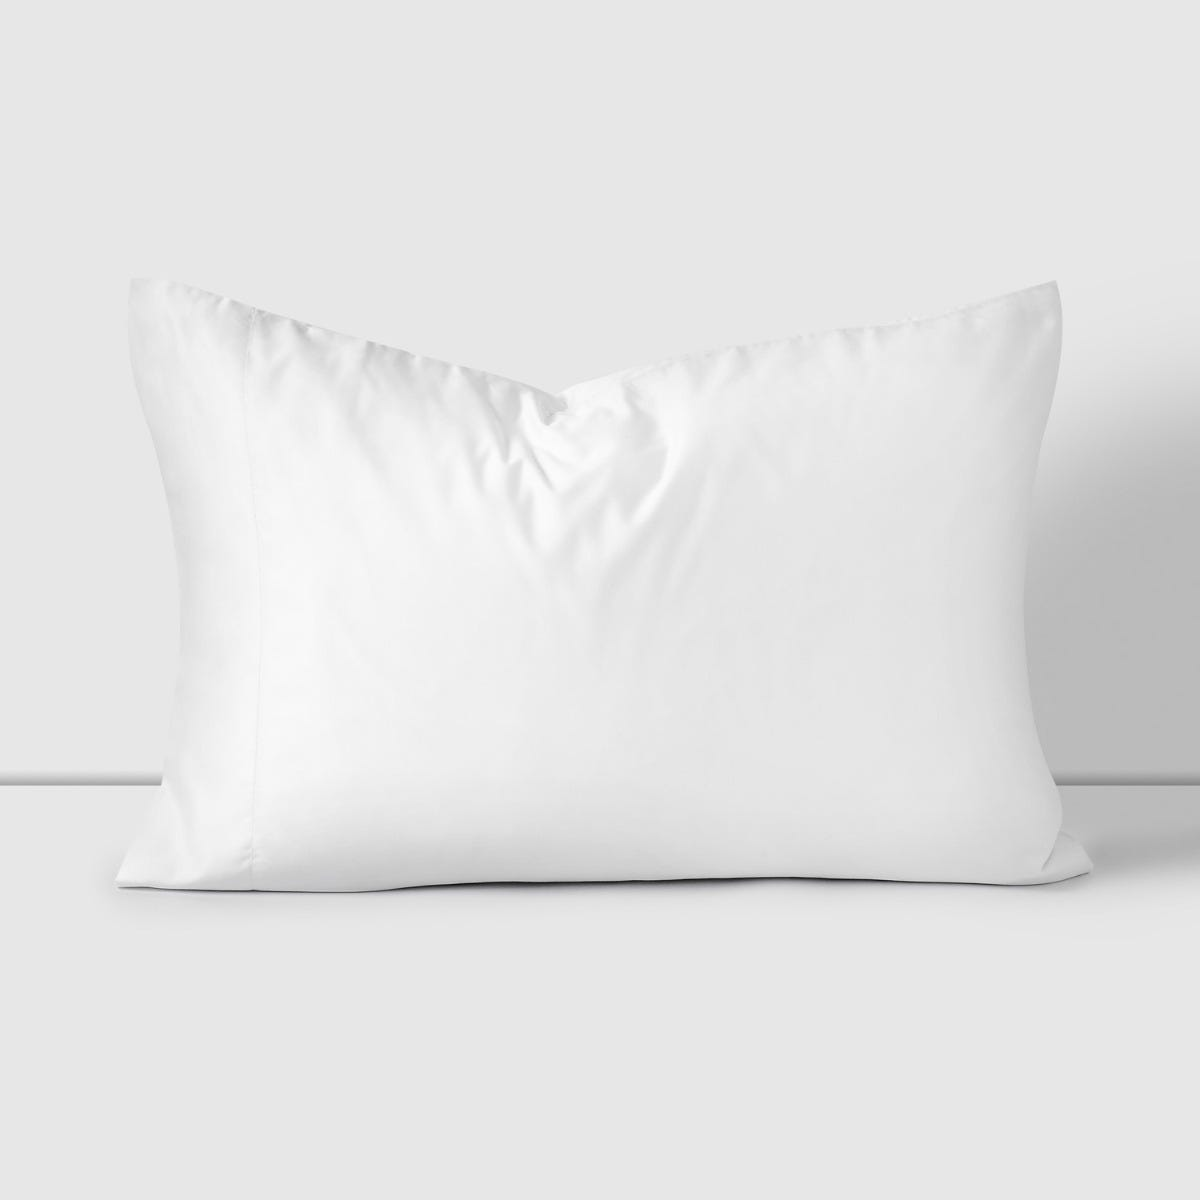 Fundas de Almohada 200H Liso Blanco 52x76 cm